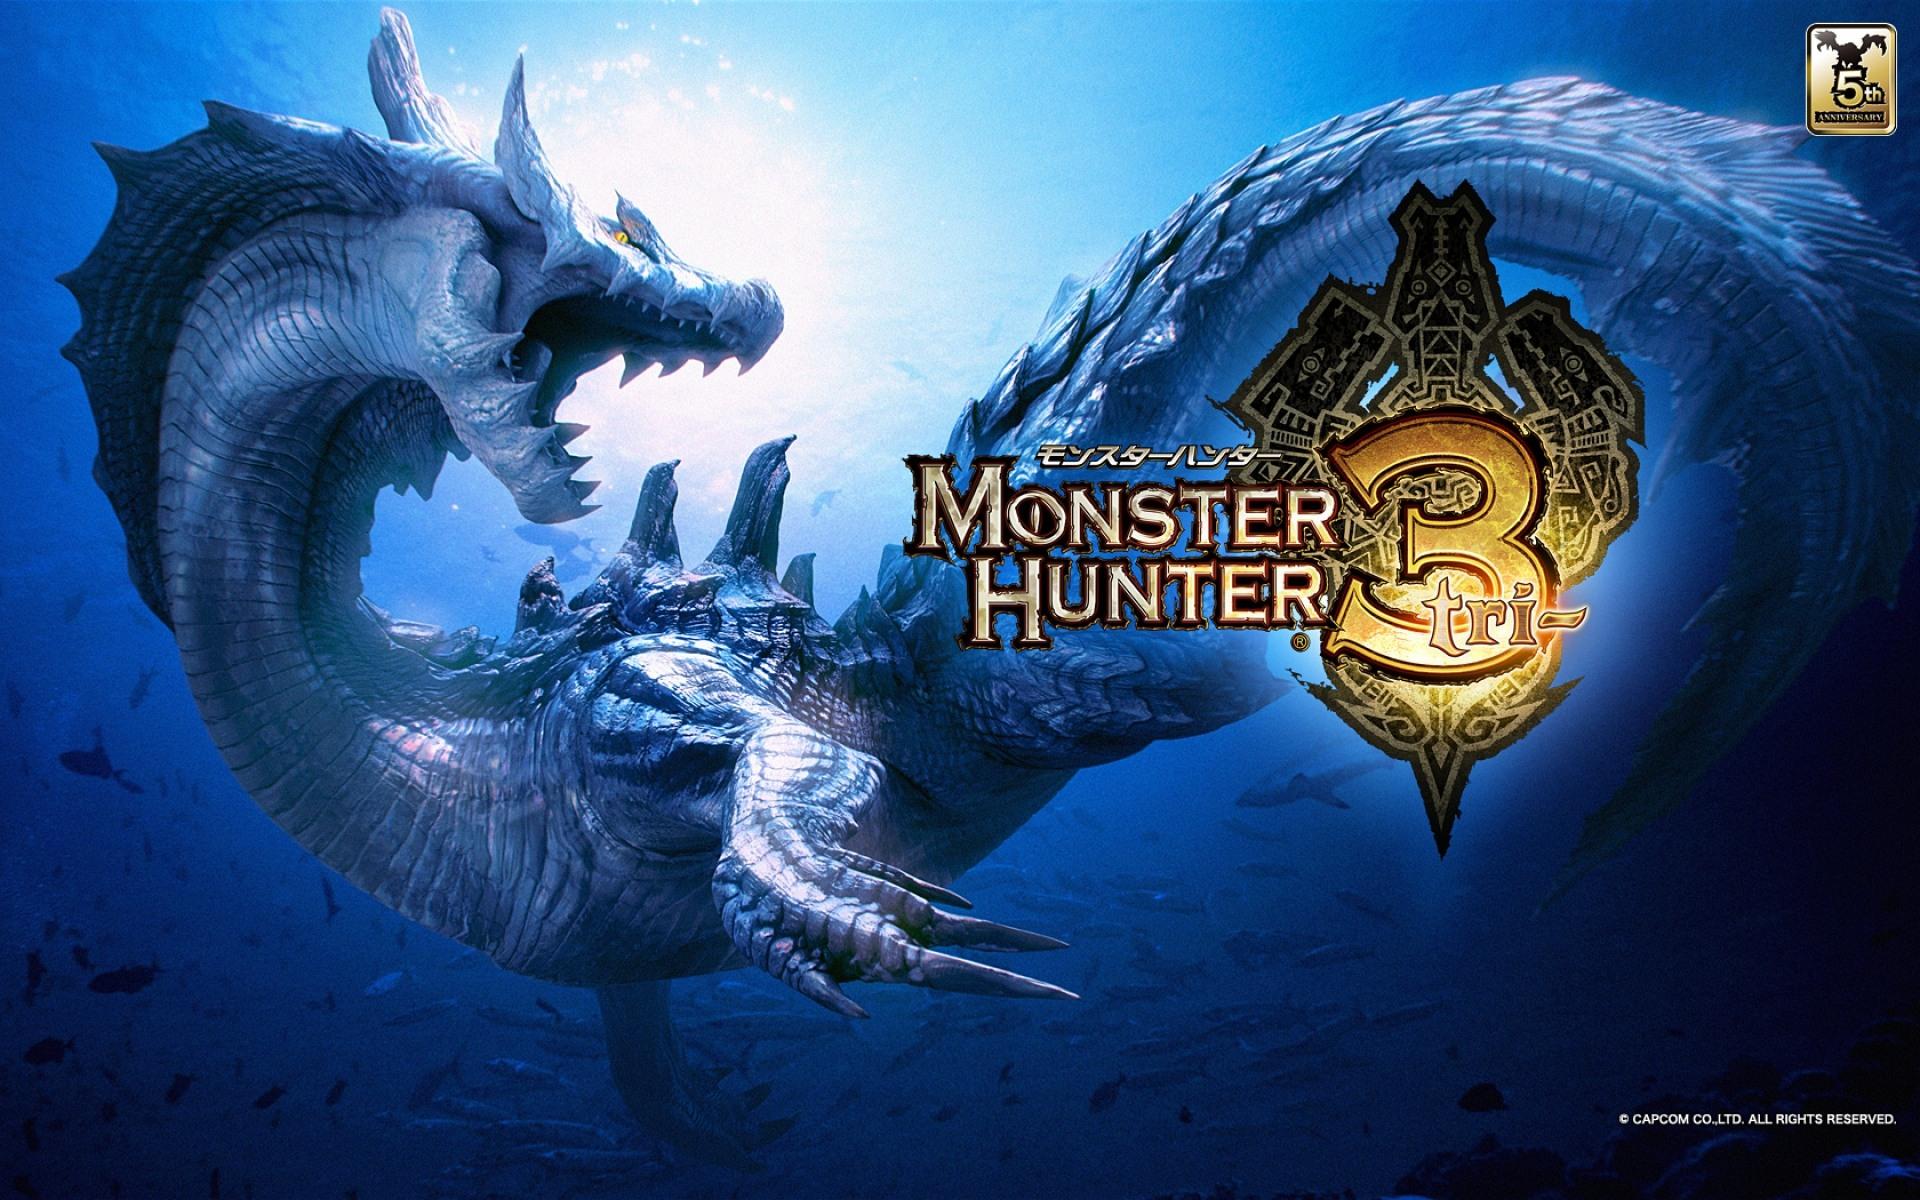 Monster Hunter Tri Online Servers Will Be Shut Down In April